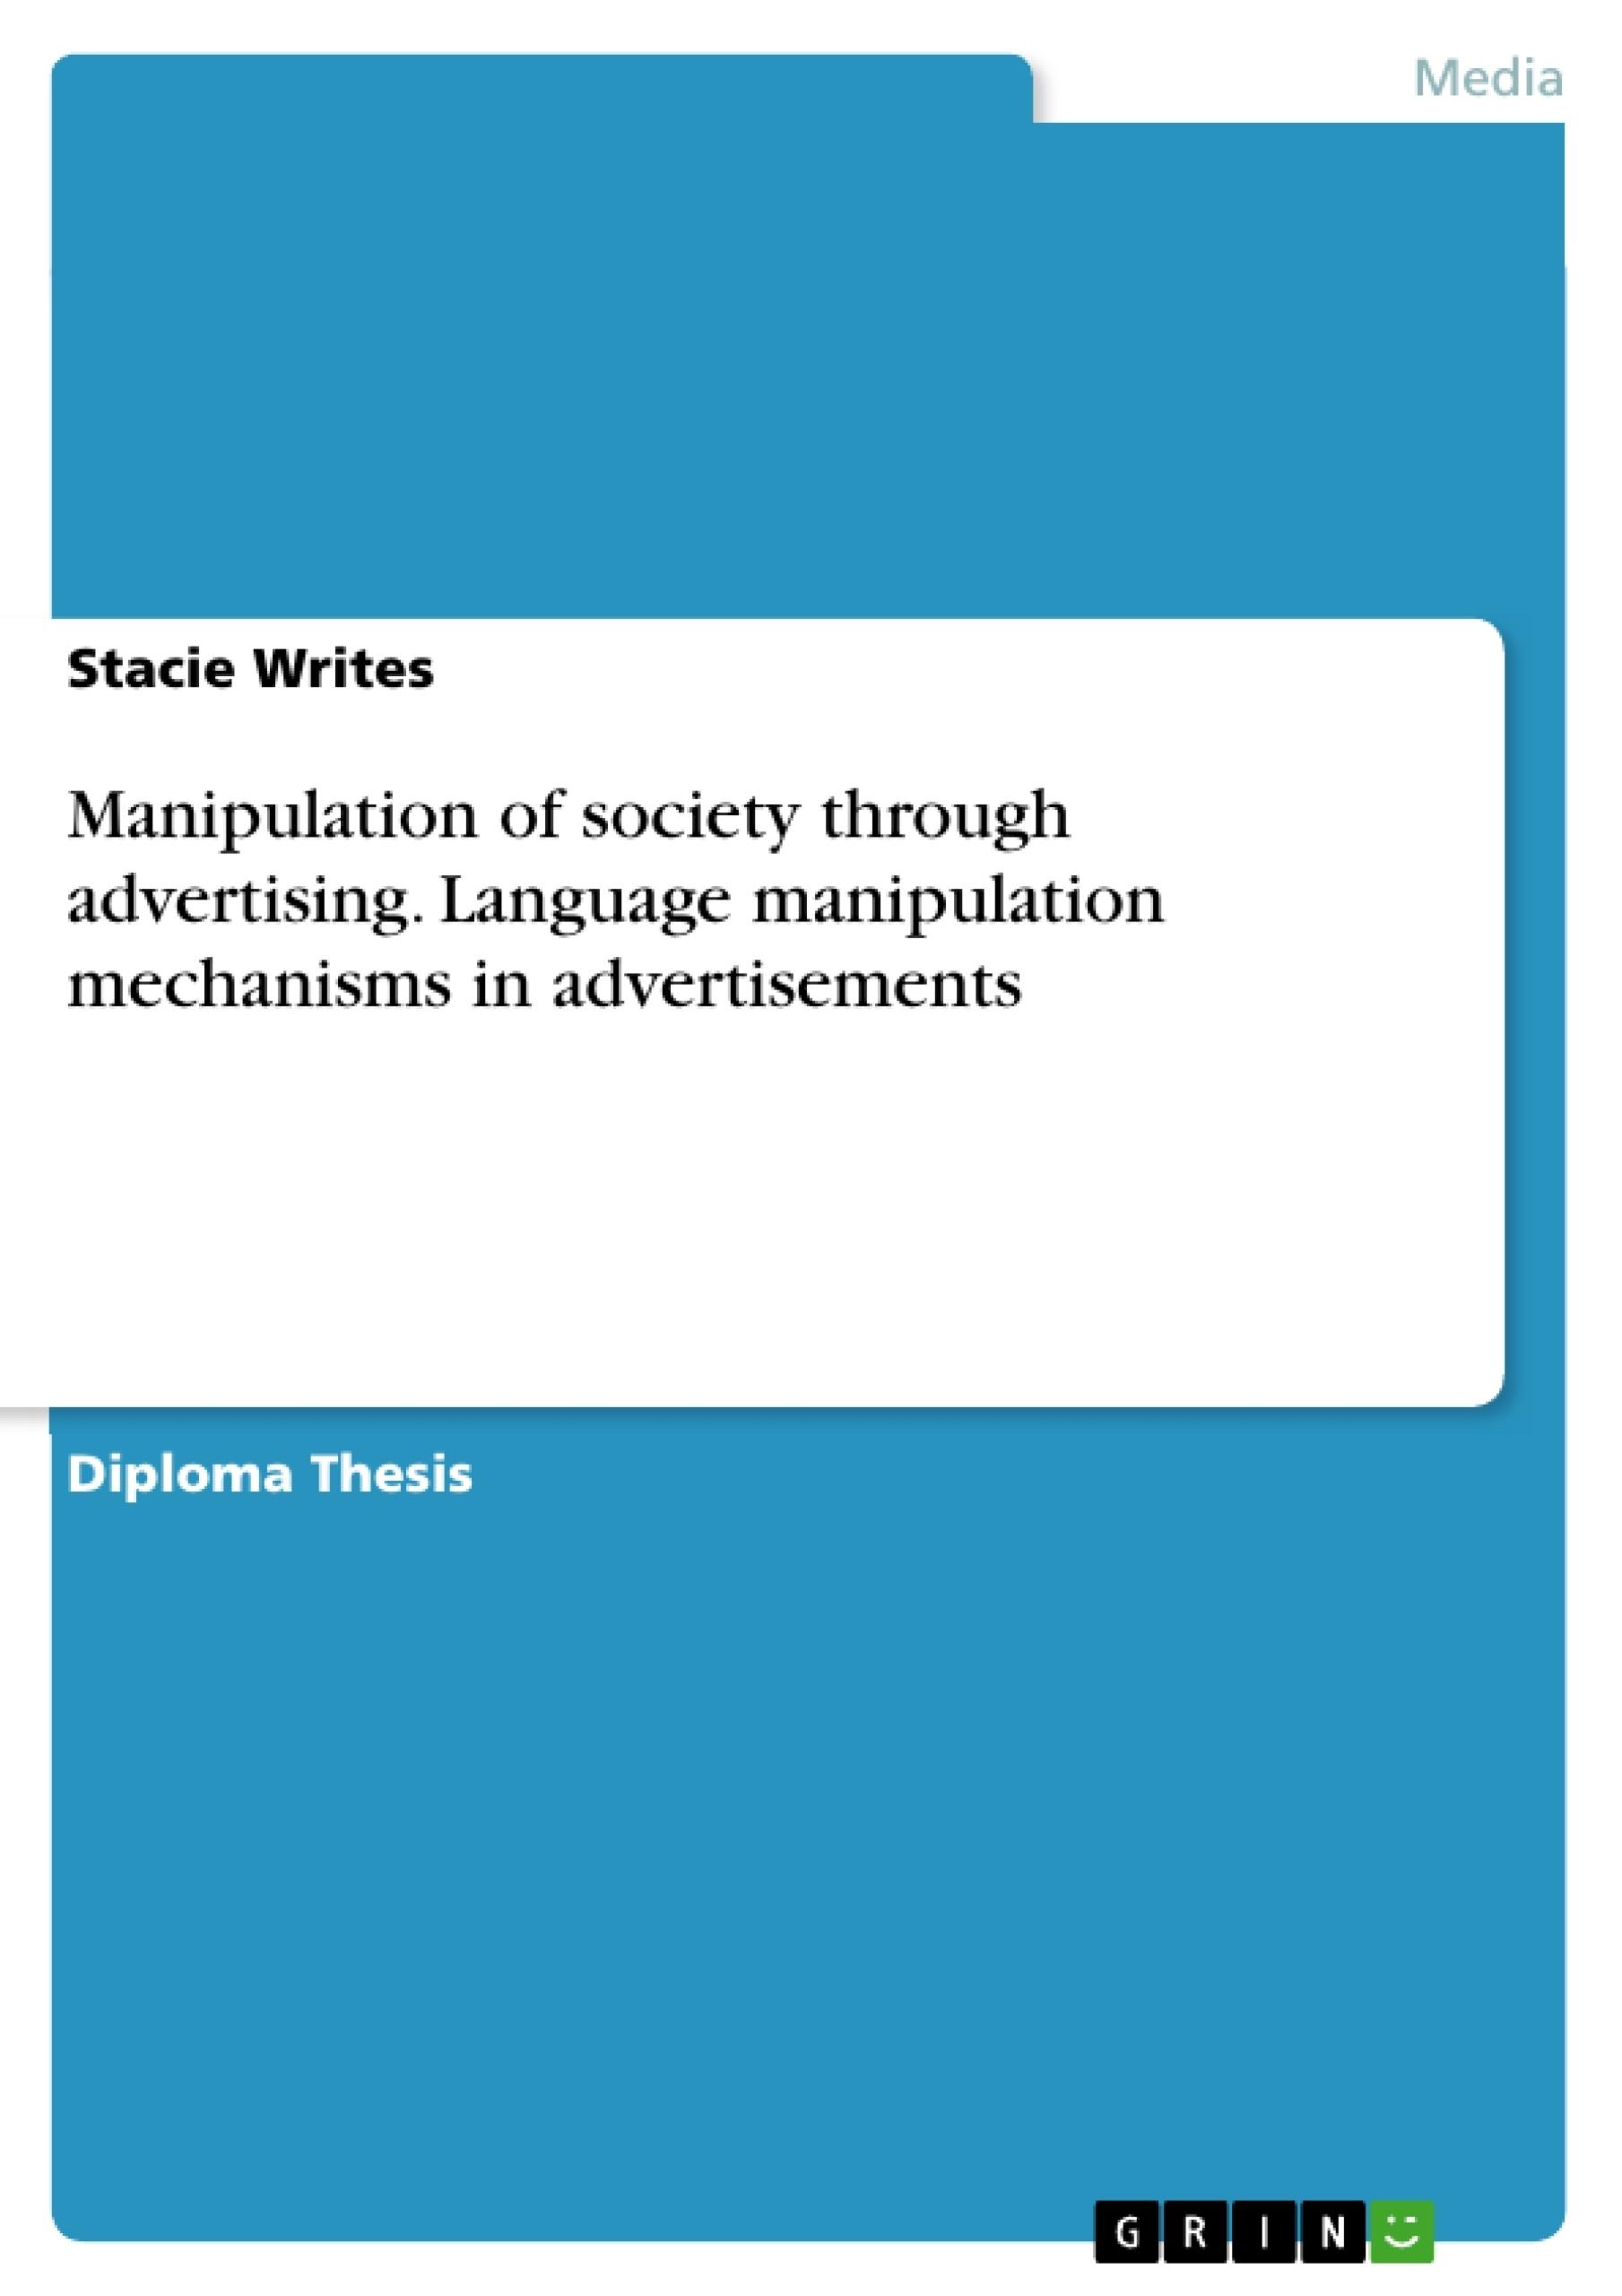 Title: Manipulation of society through advertising. Language manipulation mechanisms in advertisements